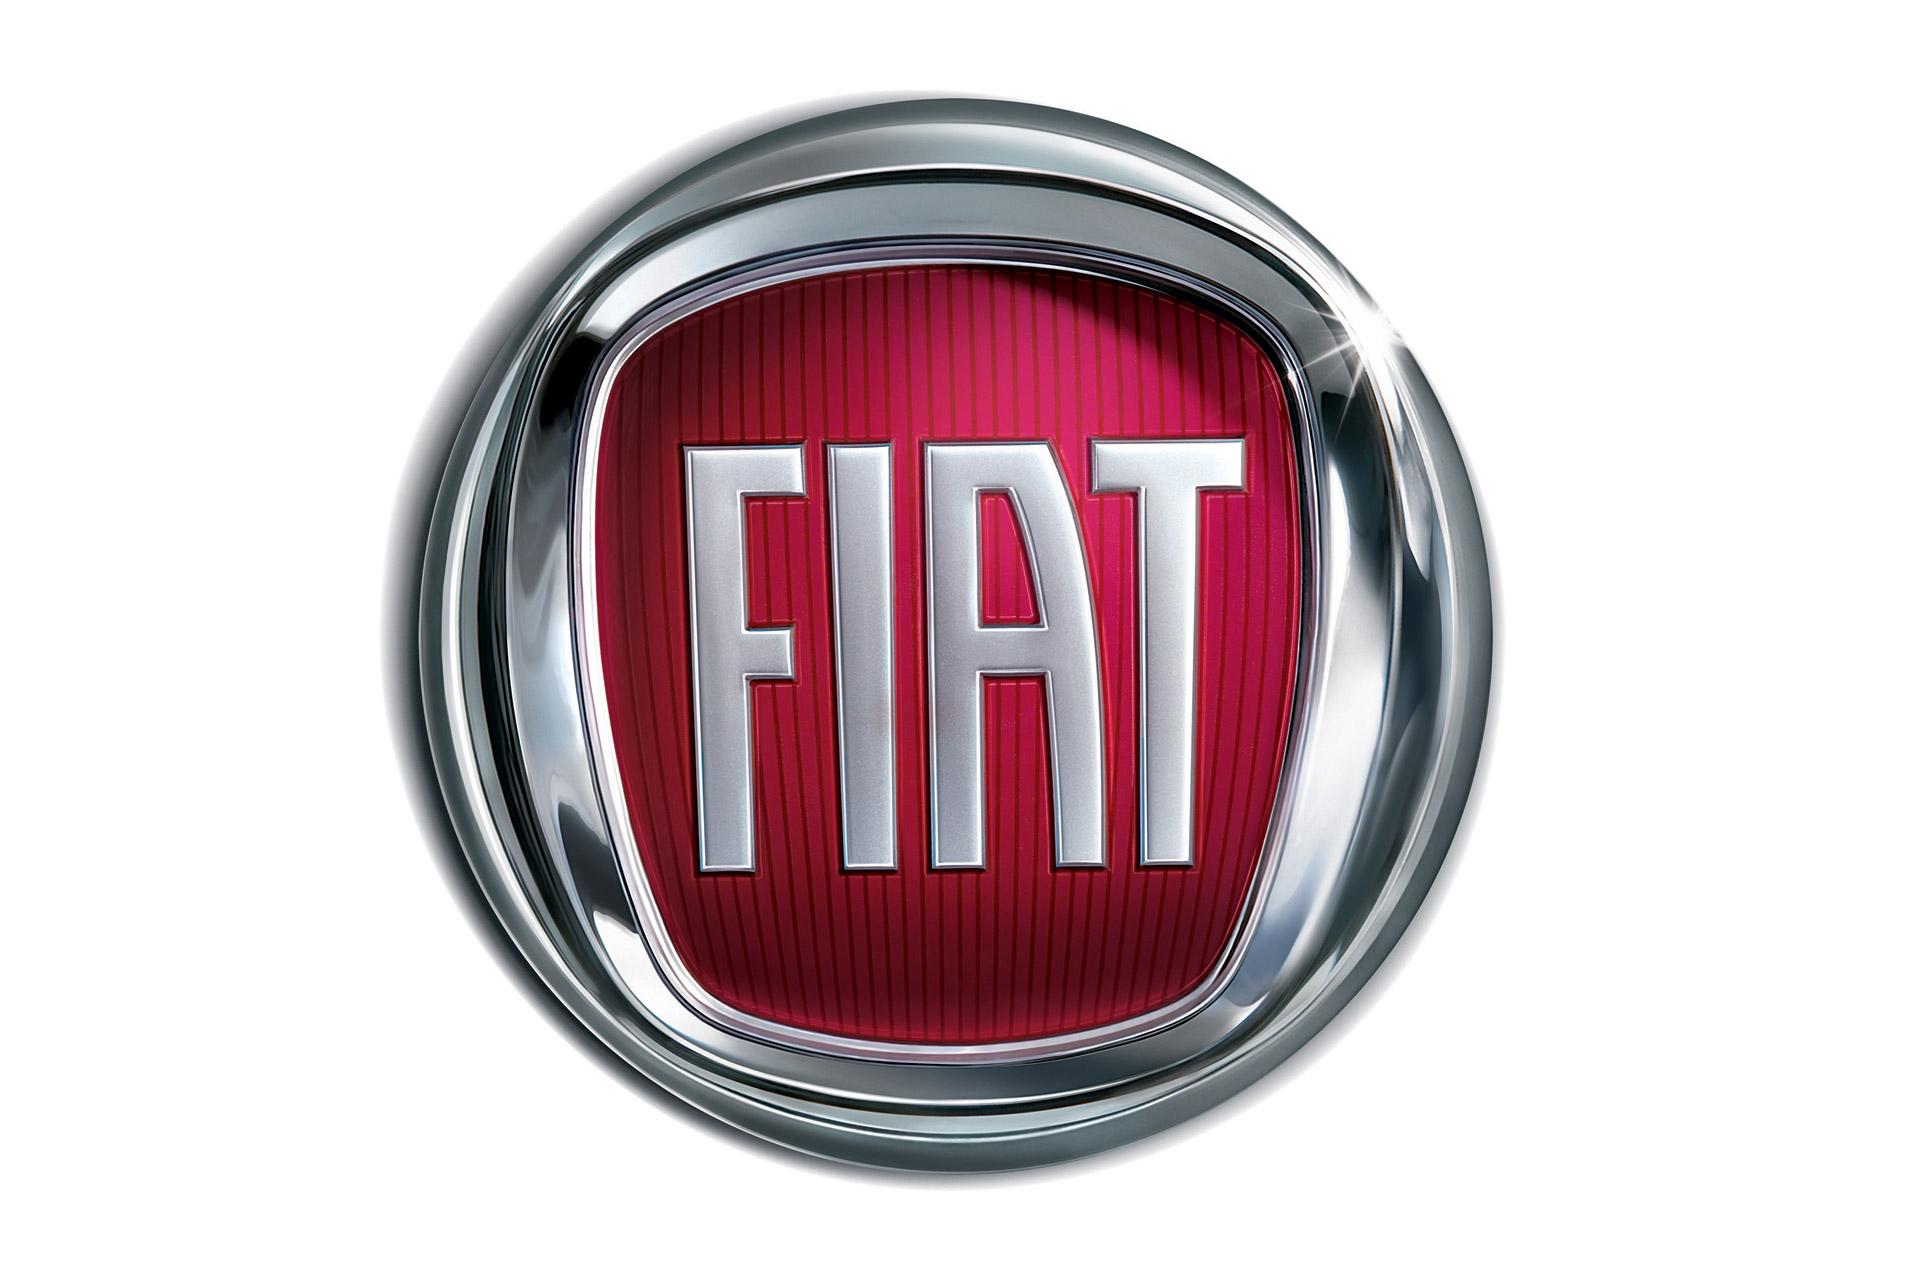 fiat-logo-100514235-h.jpg